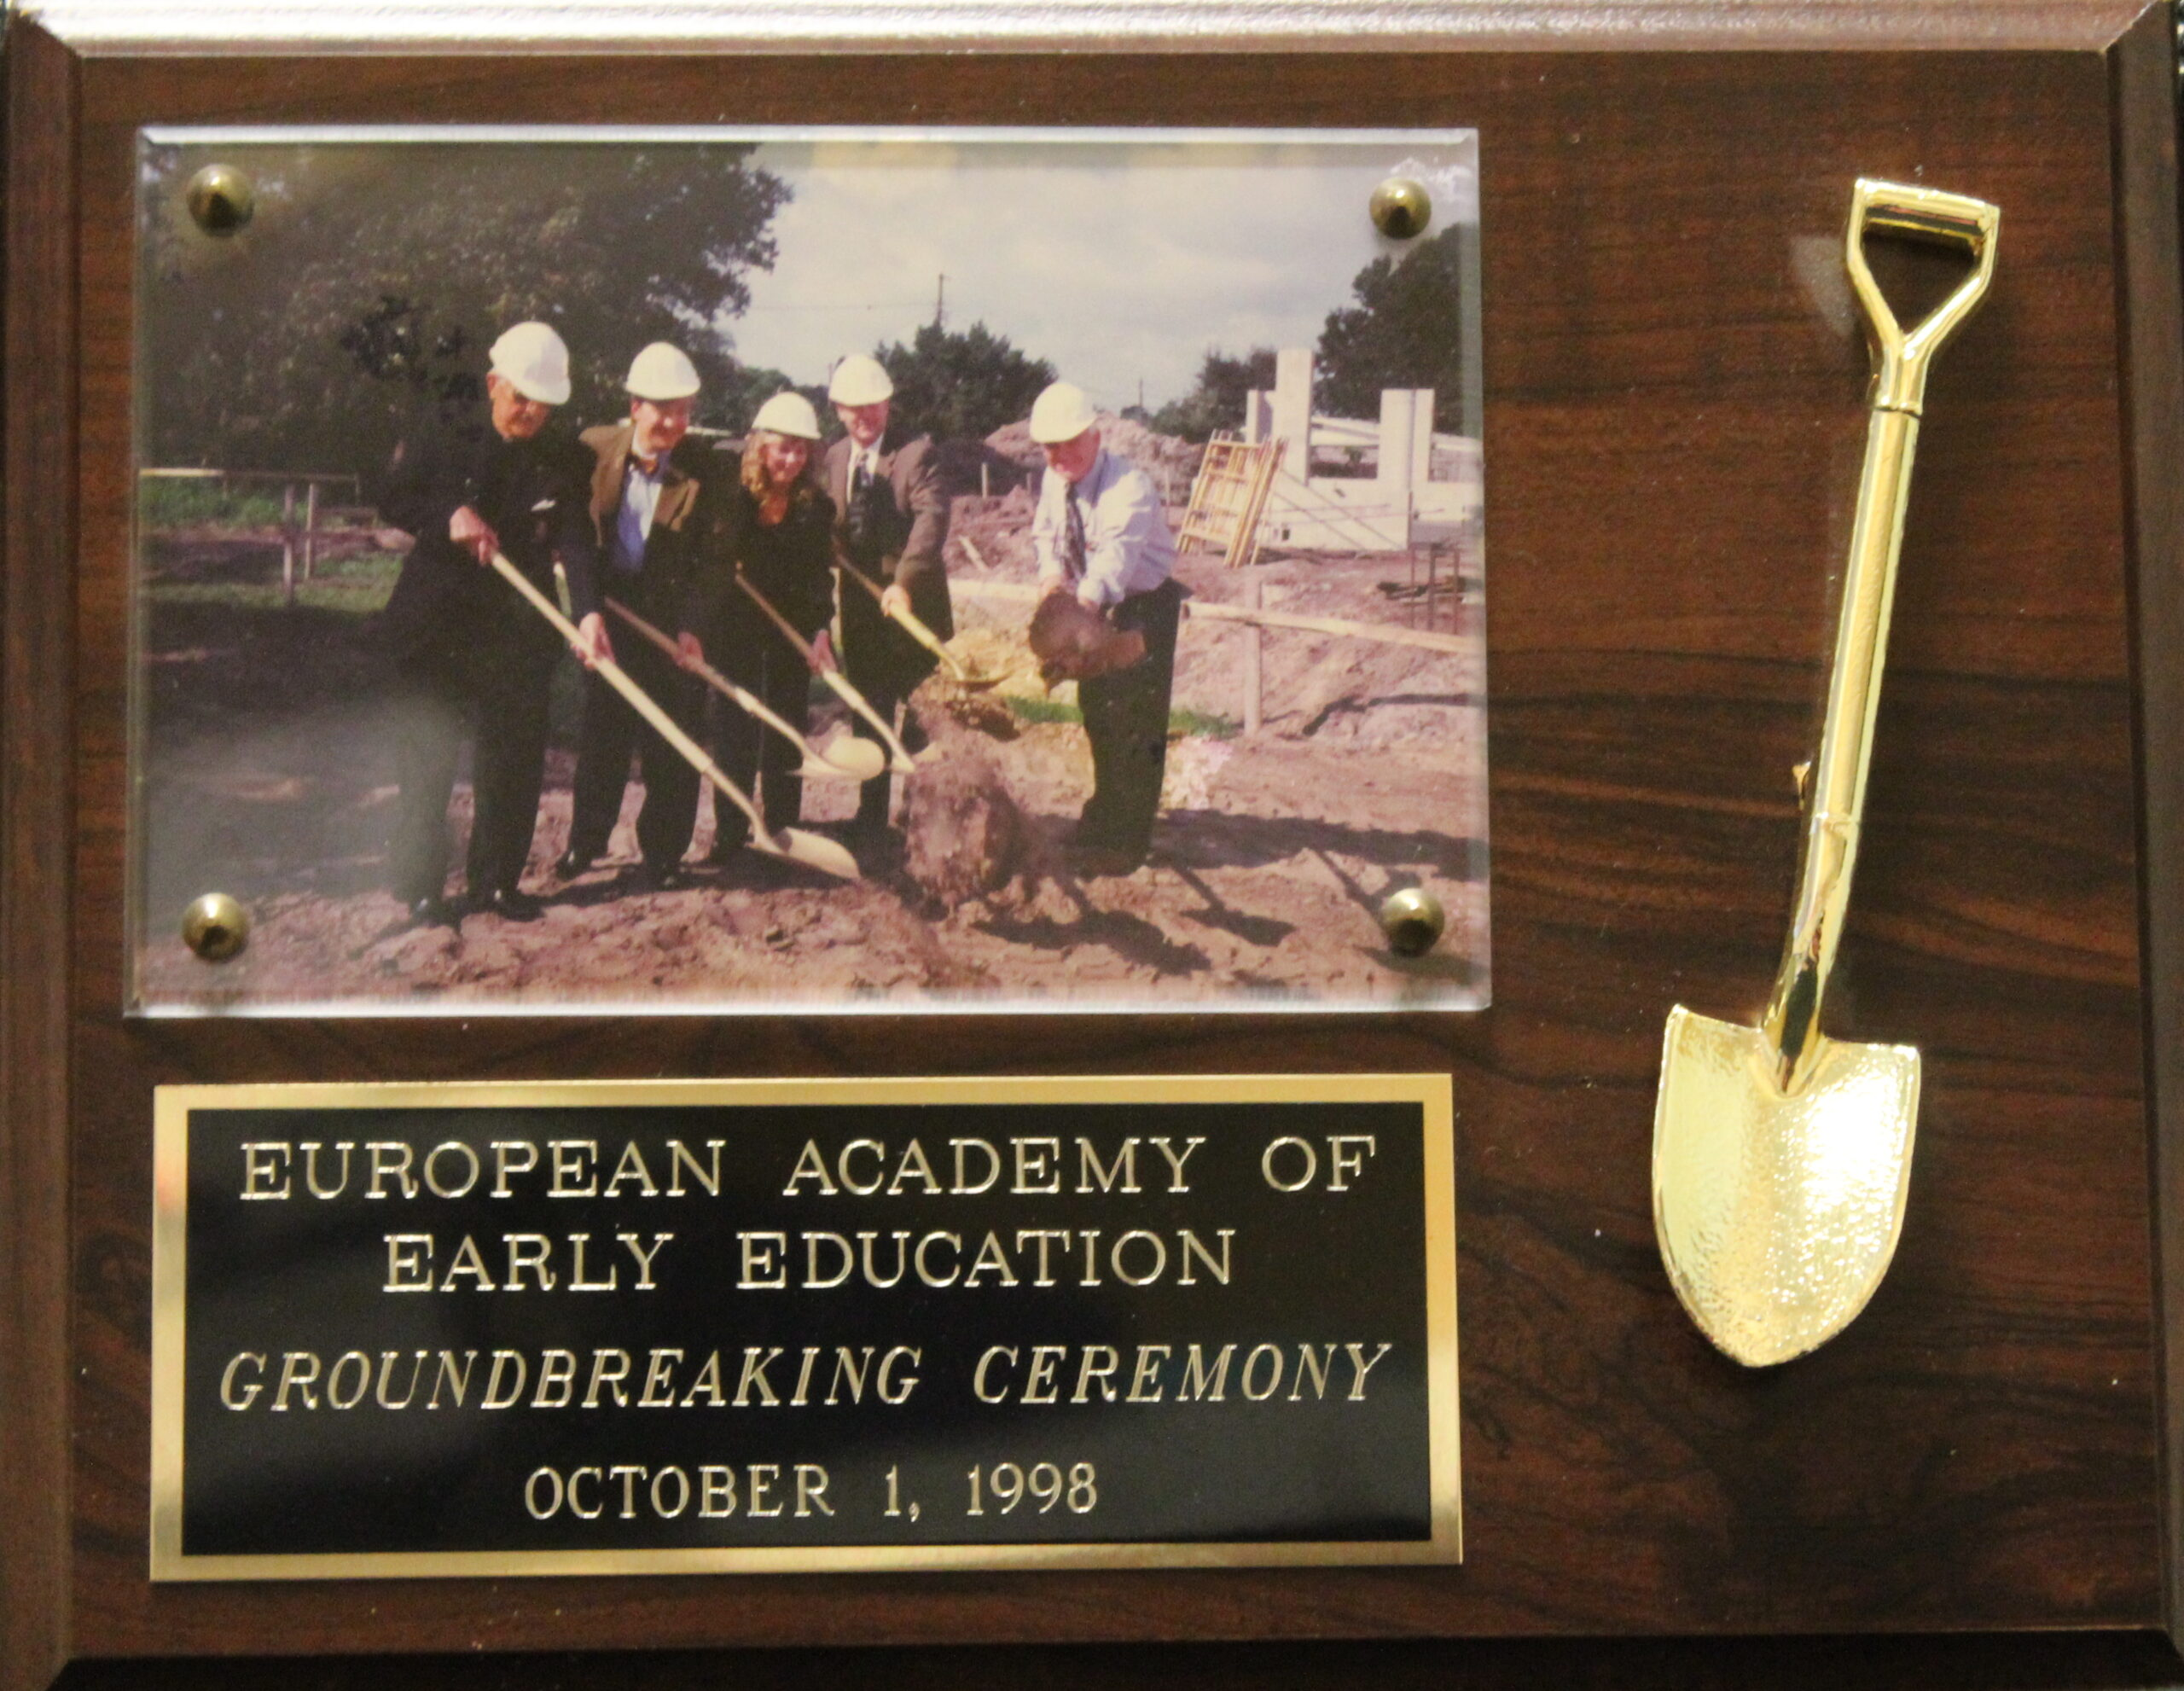 EEAE Groundbreaking ceremony image